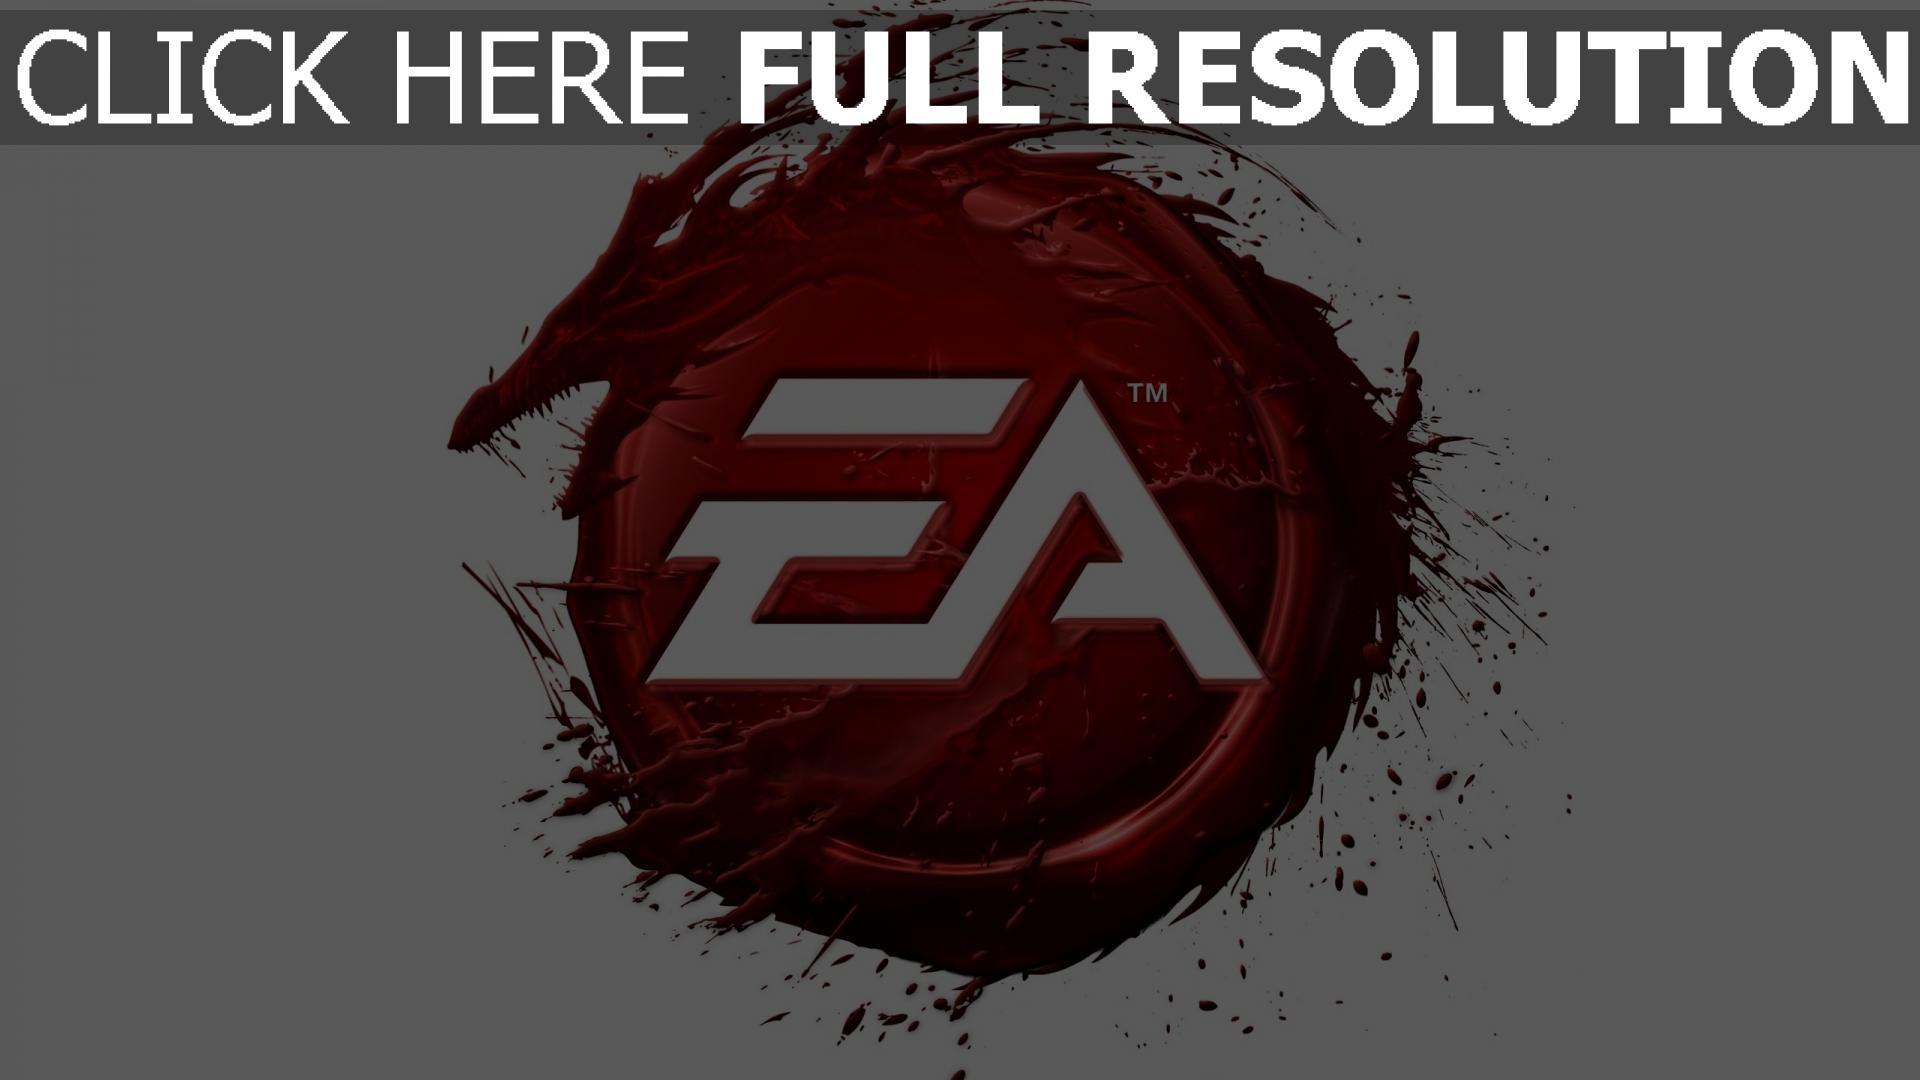 hd hintergrundbilder ea logo rot drache blut 1920x1080